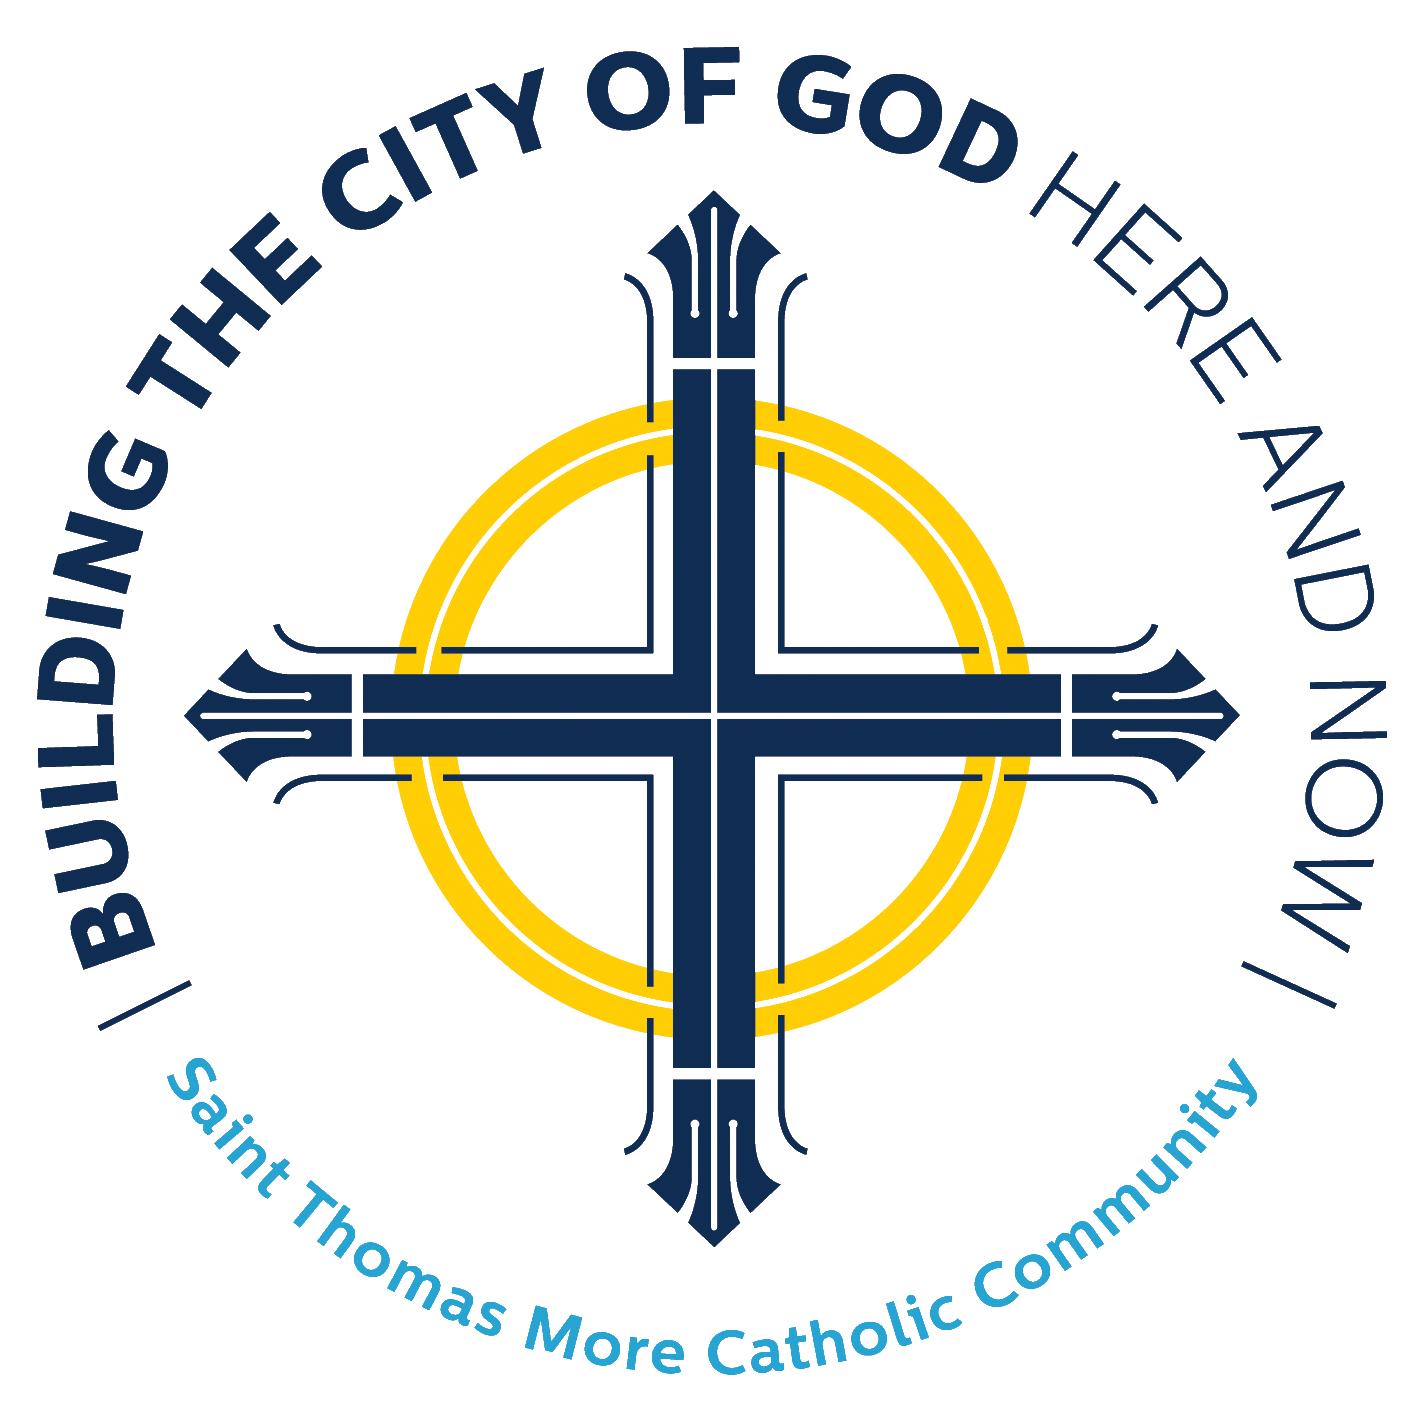 Pastor clipart catholic community. St thomas more church